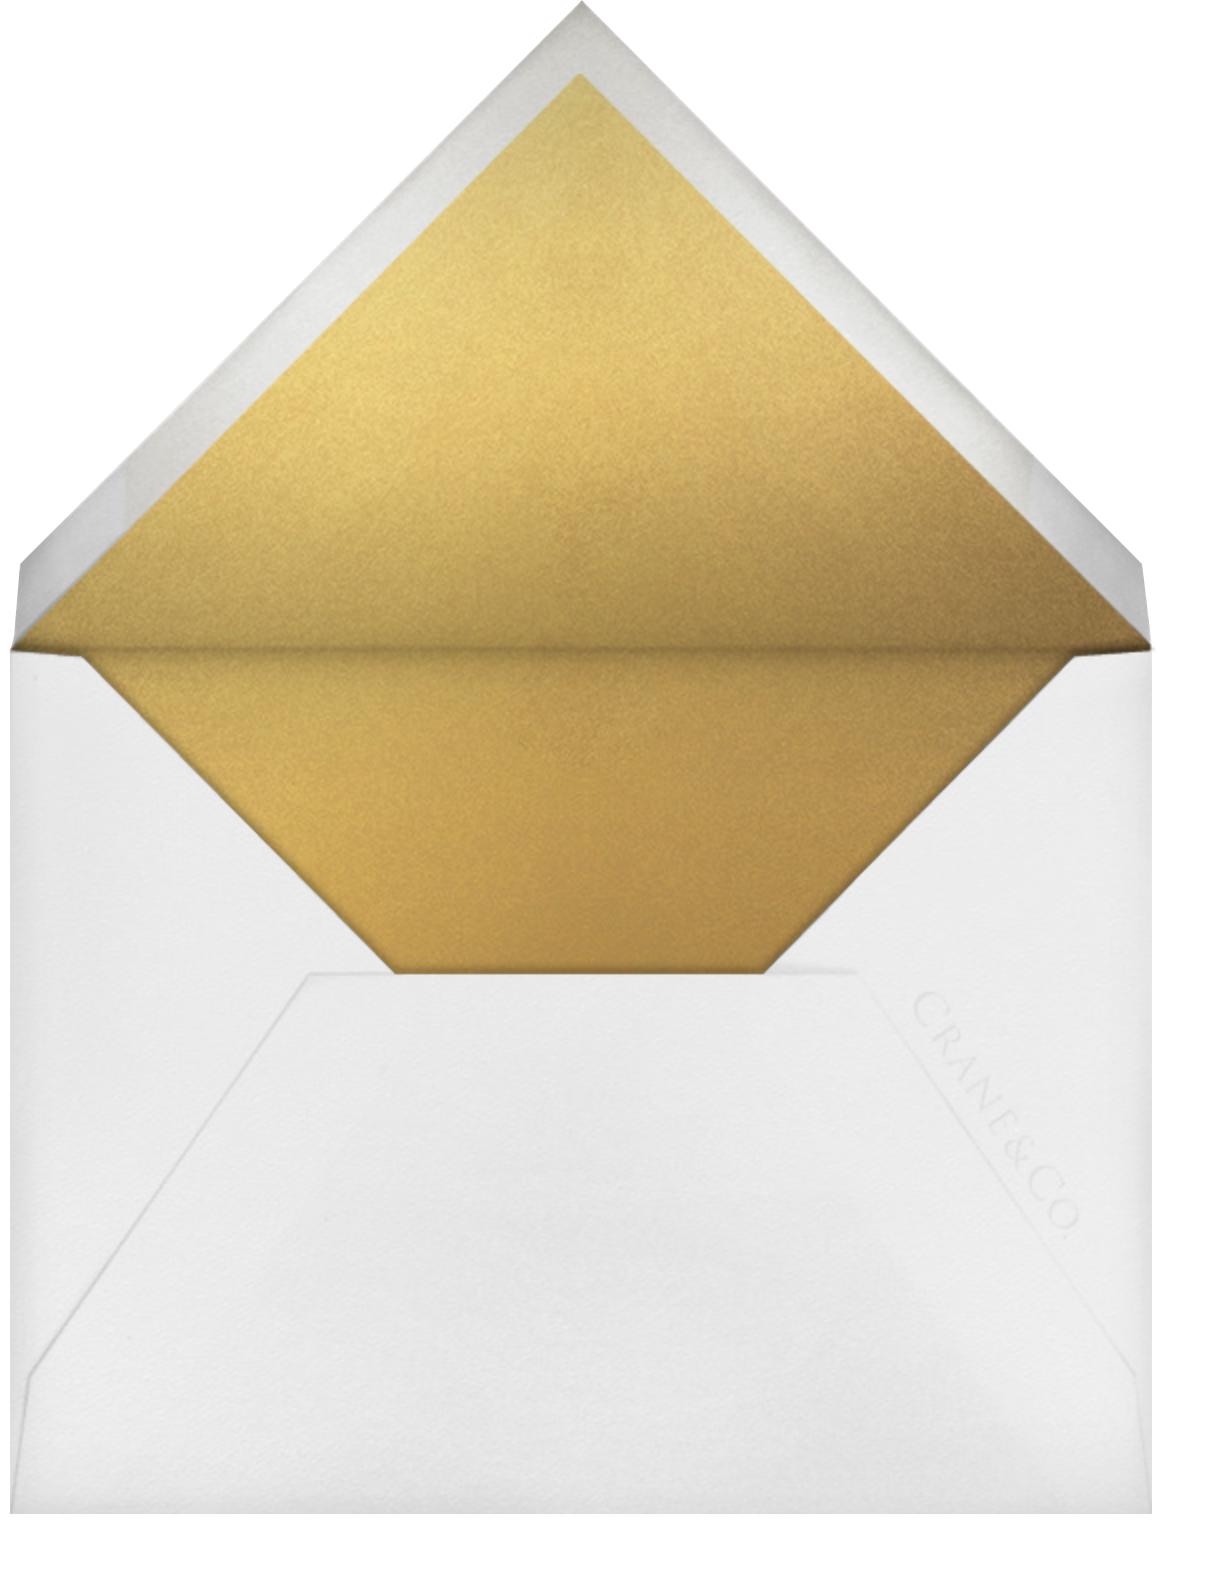 Silk Brocade I (Save the Date) - Gold - Oscar de la Renta - Save the date - envelope back